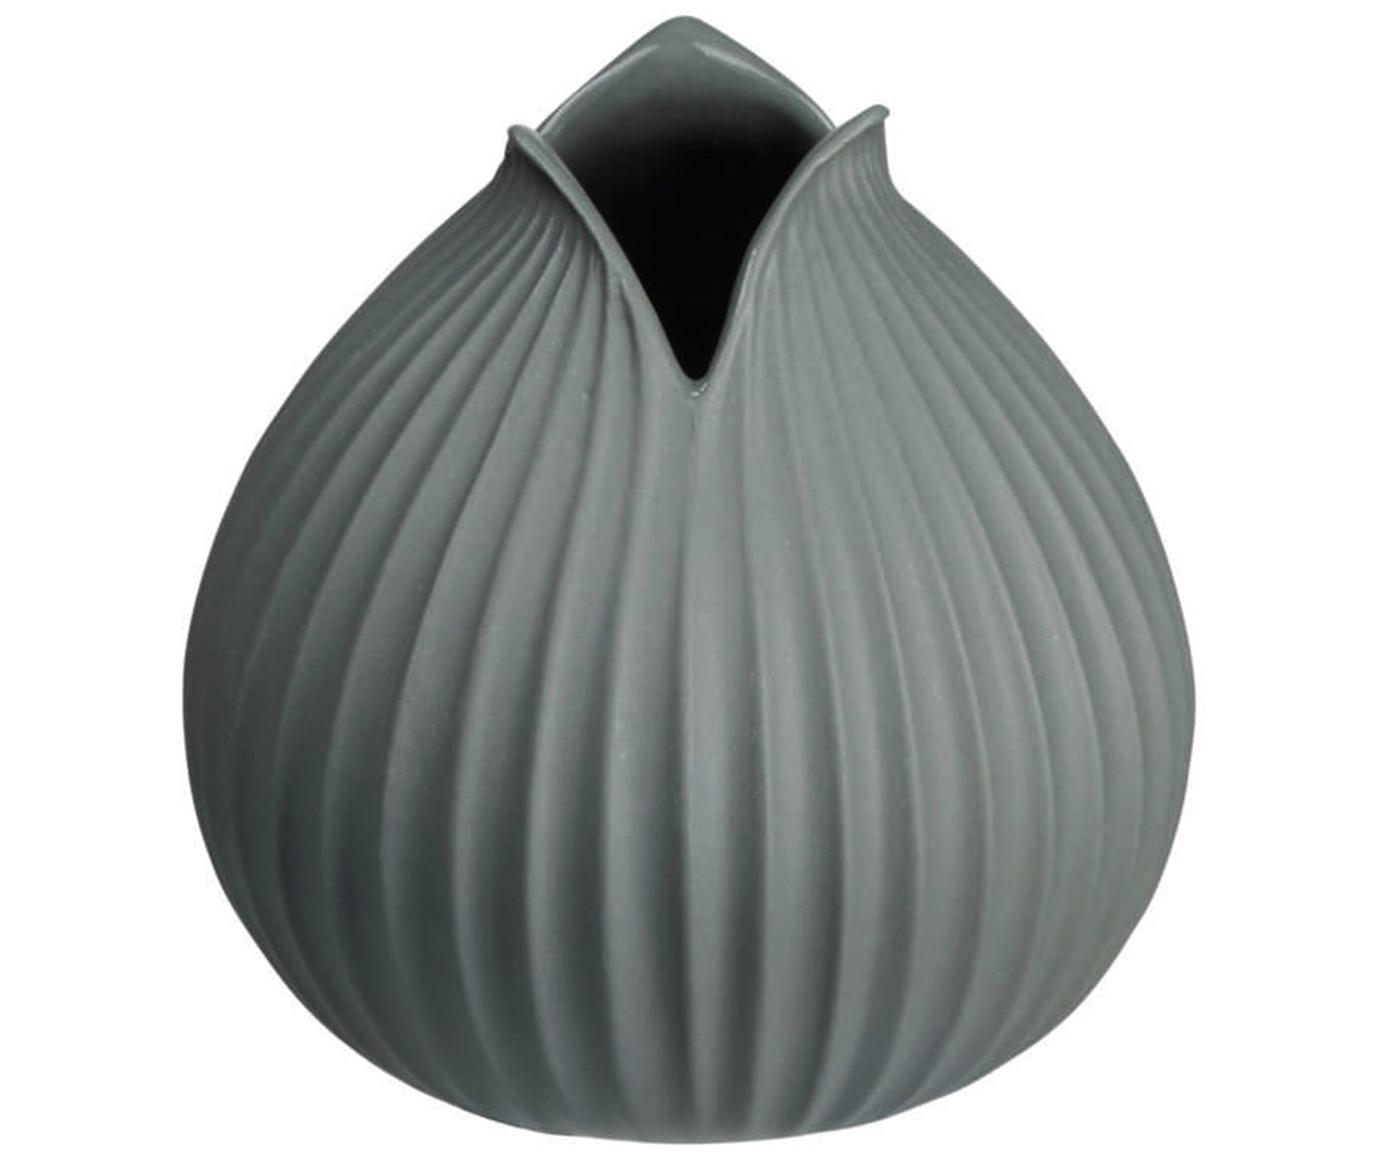 Handgefertigte Vase Yoko aus Porzellan, Porzellan, Grau, Ø 10 x H 11 cm